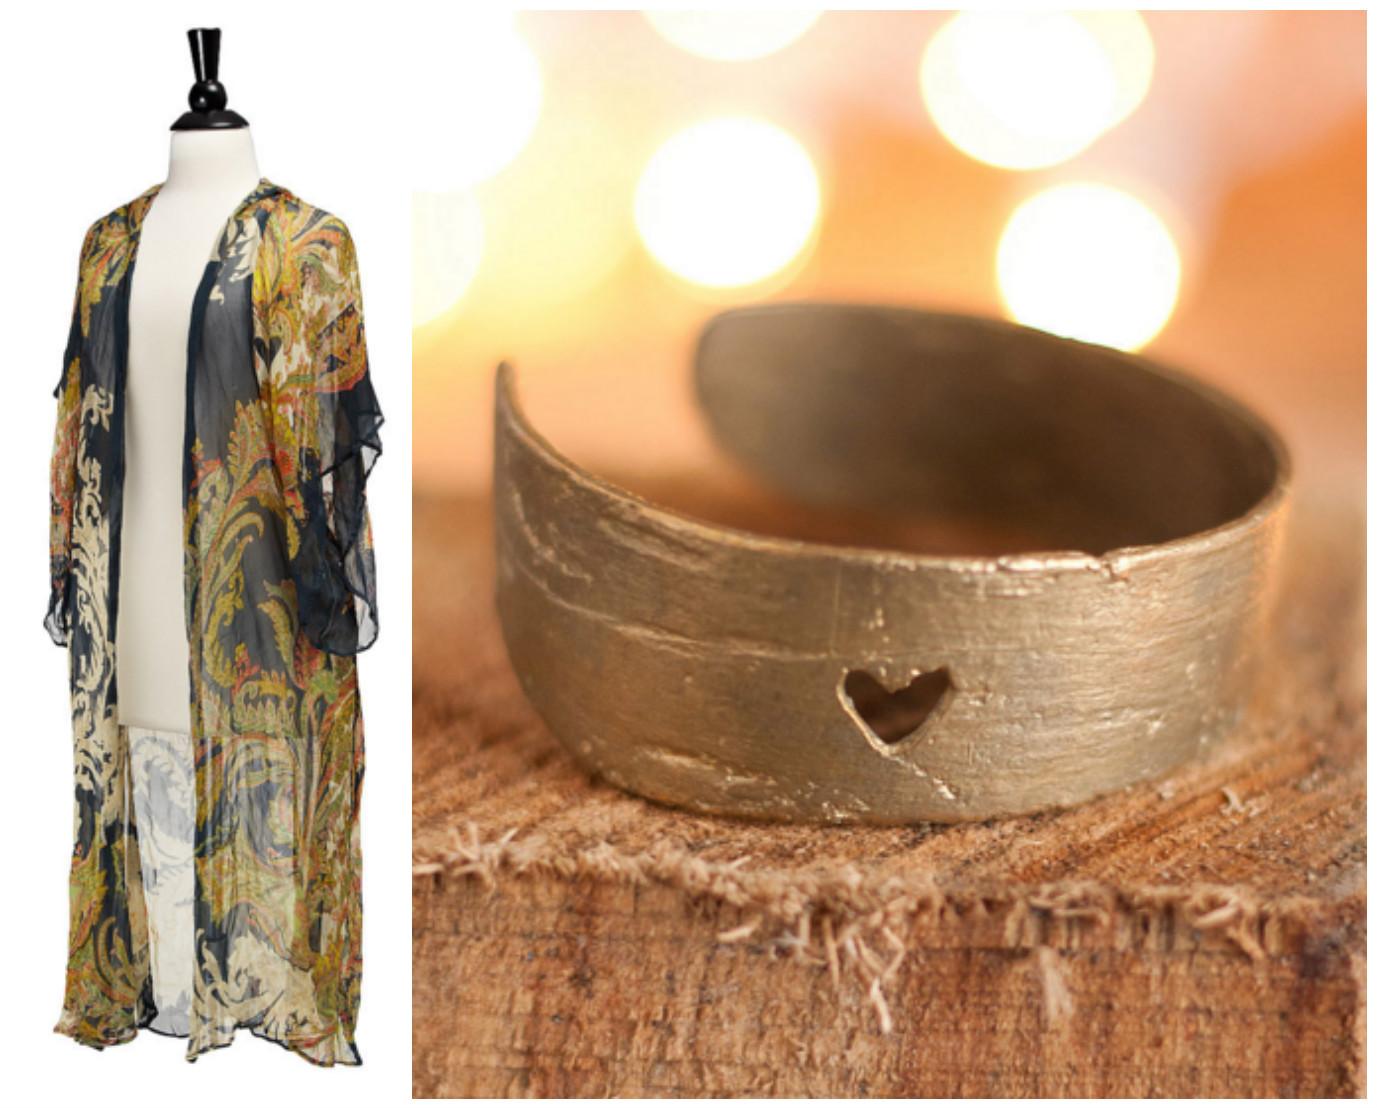 Long Sheer Loungewear Kimono & Love Birch Cuff|UncommonGoods